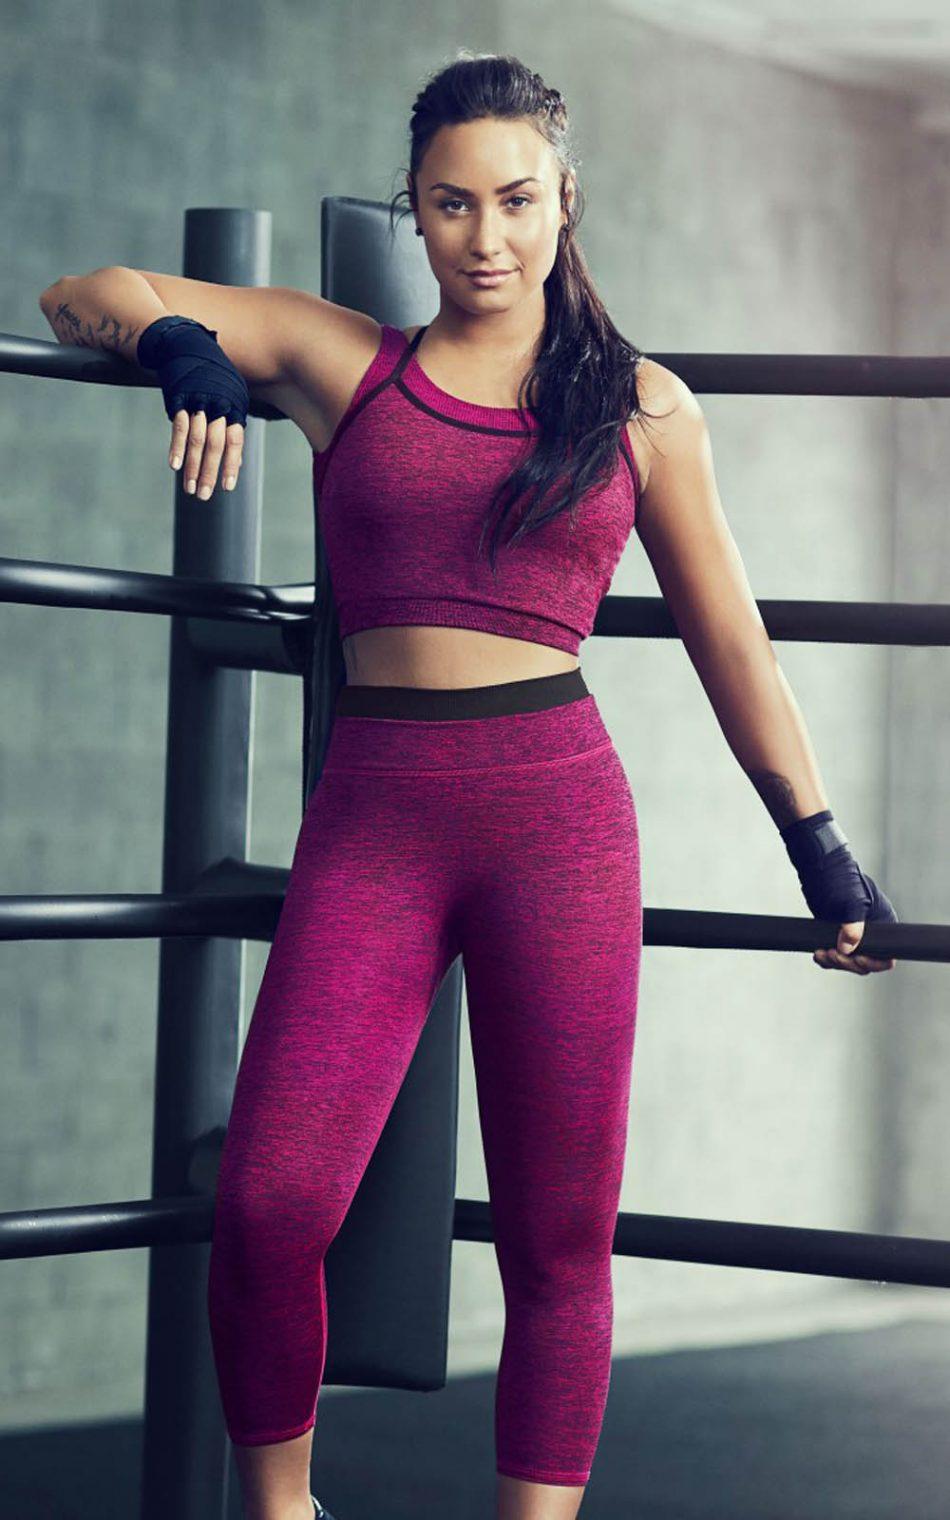 Demi Lovato Fabletics Workout HD Mobile Wallpaper